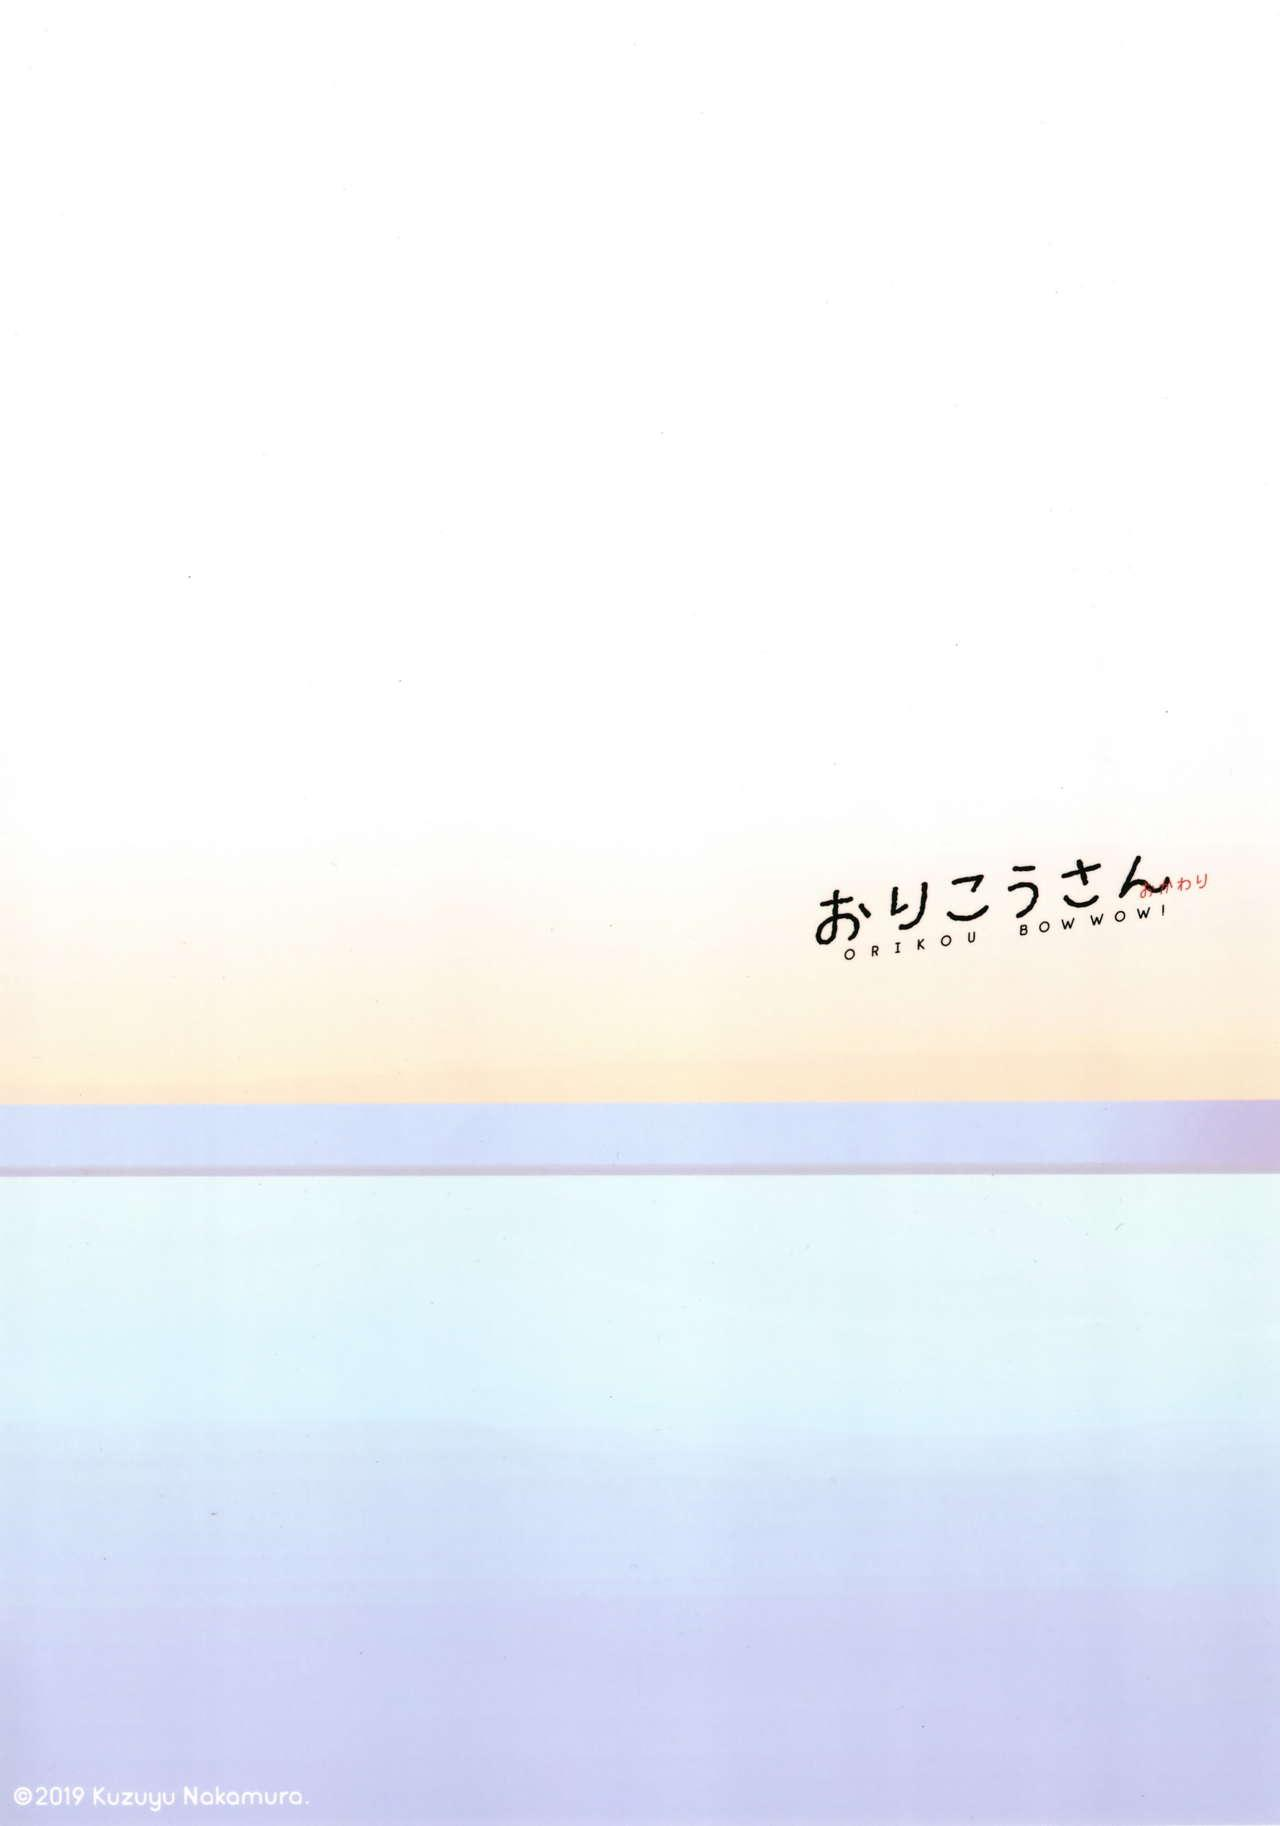 (COMITIA130) [smooth (Nakamura Kuzuyu)] Orikou-san -Okawari- 27